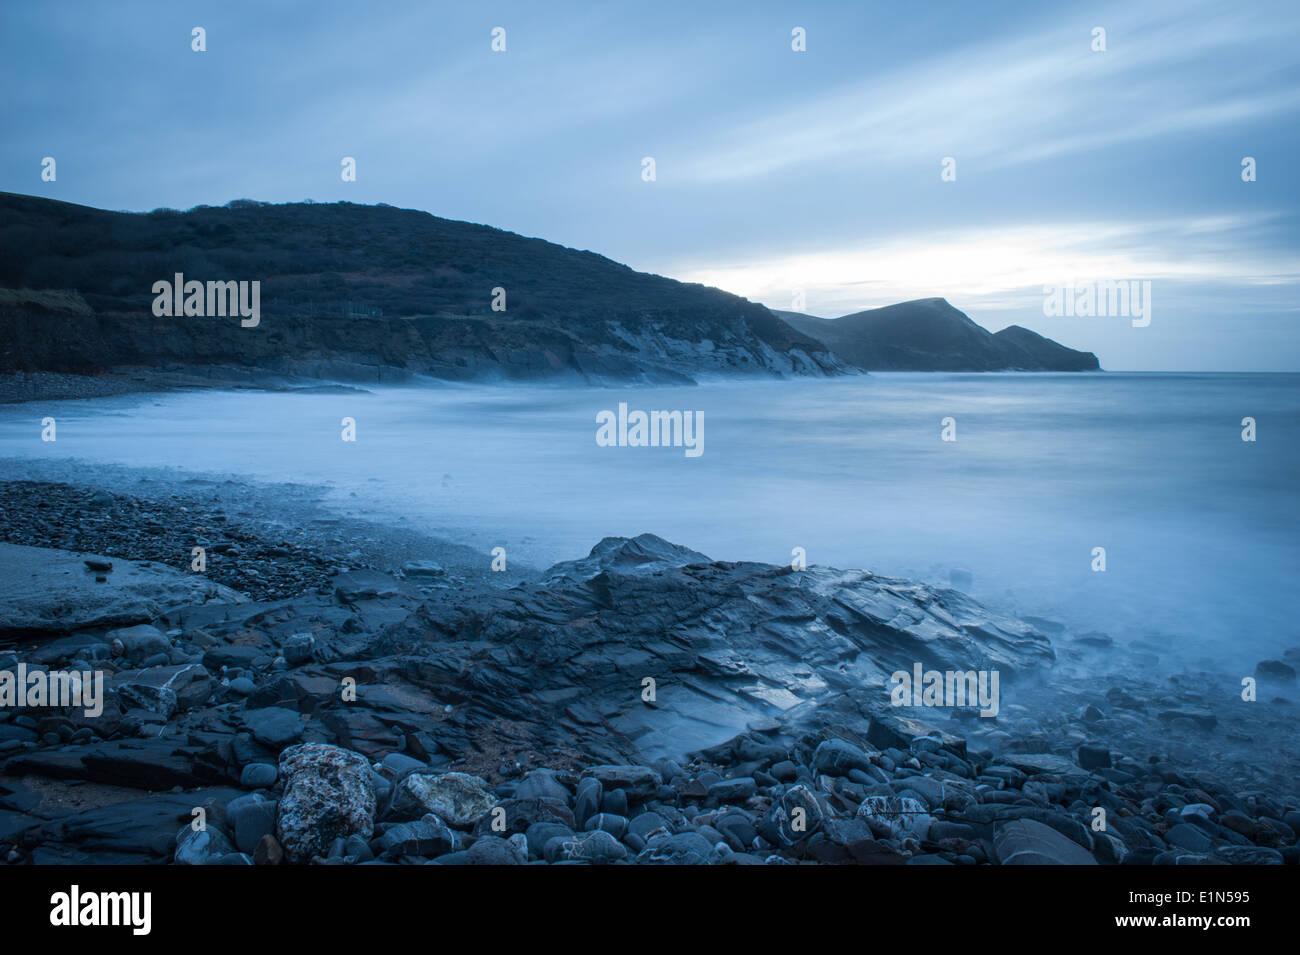 Seascape at Crackington Haven beach North Cornwall - Stock Image